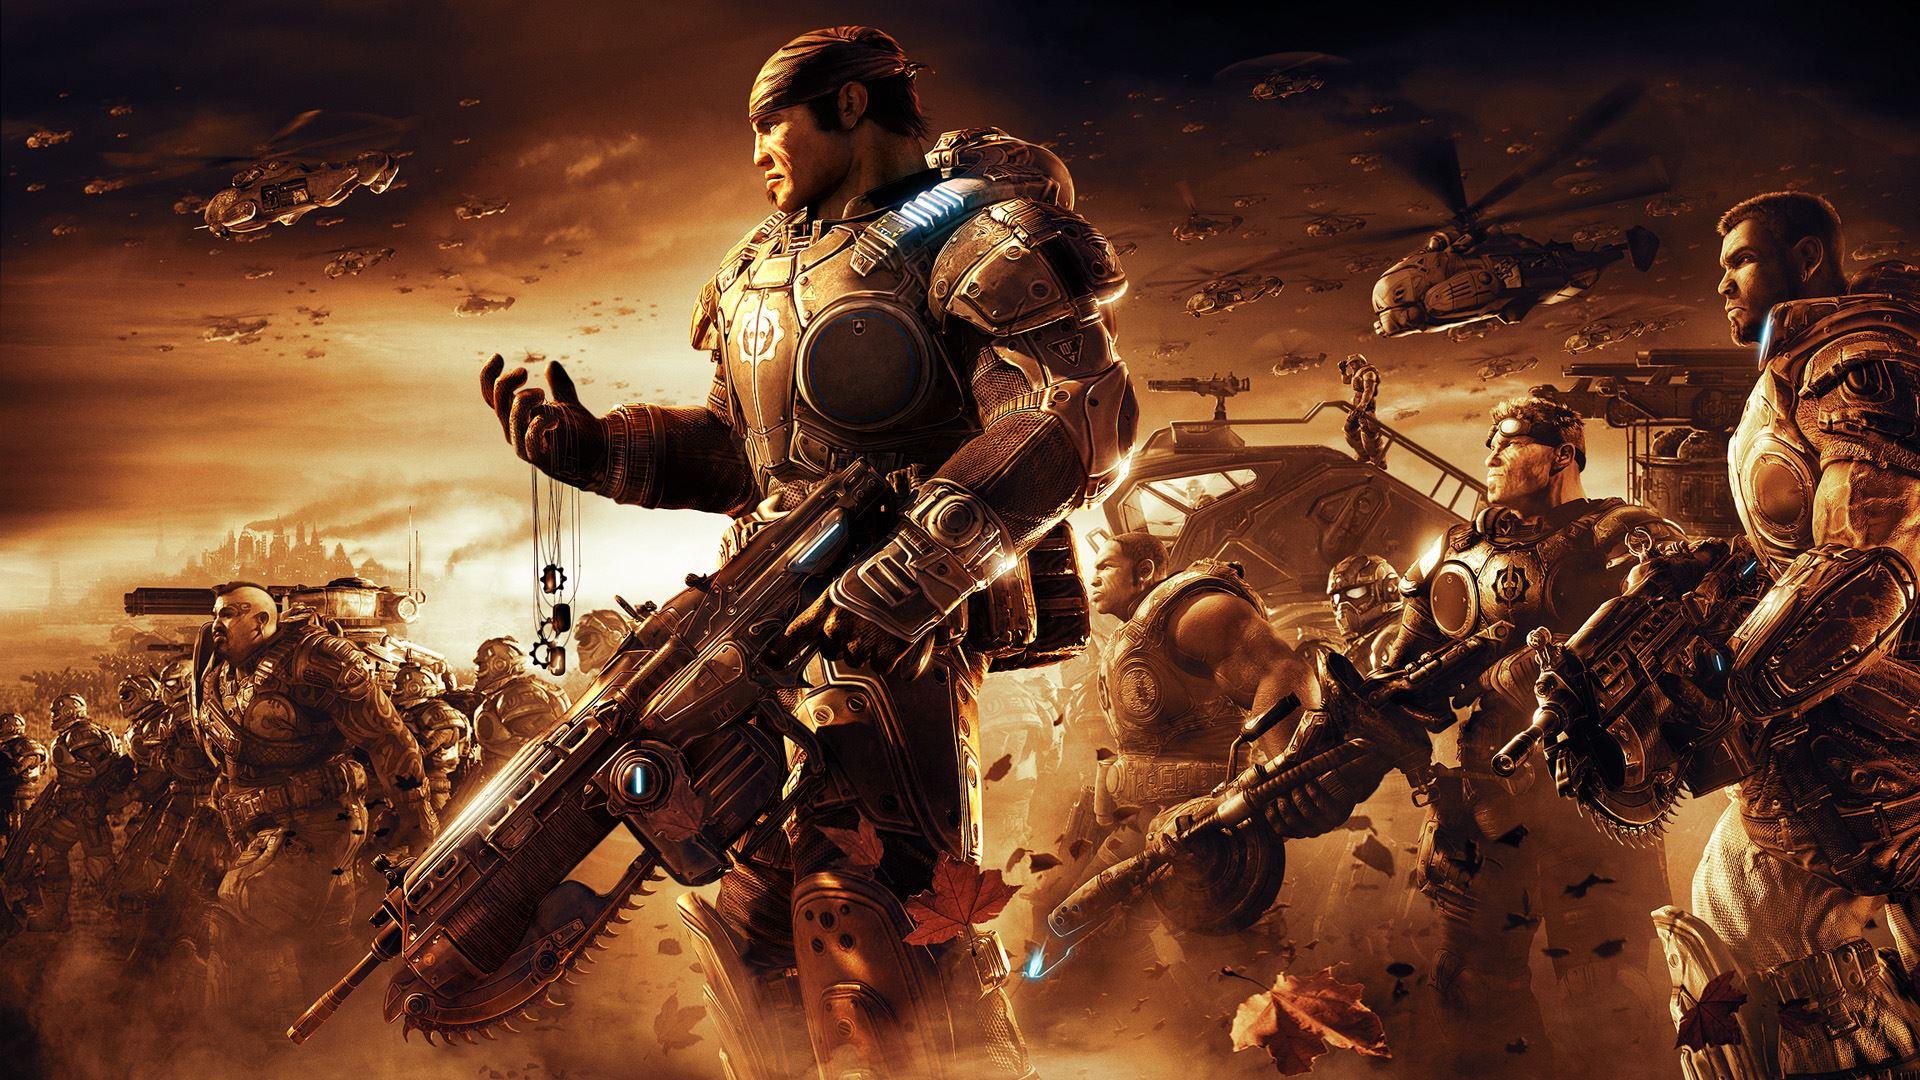 Gears of War 2 Splash Damage